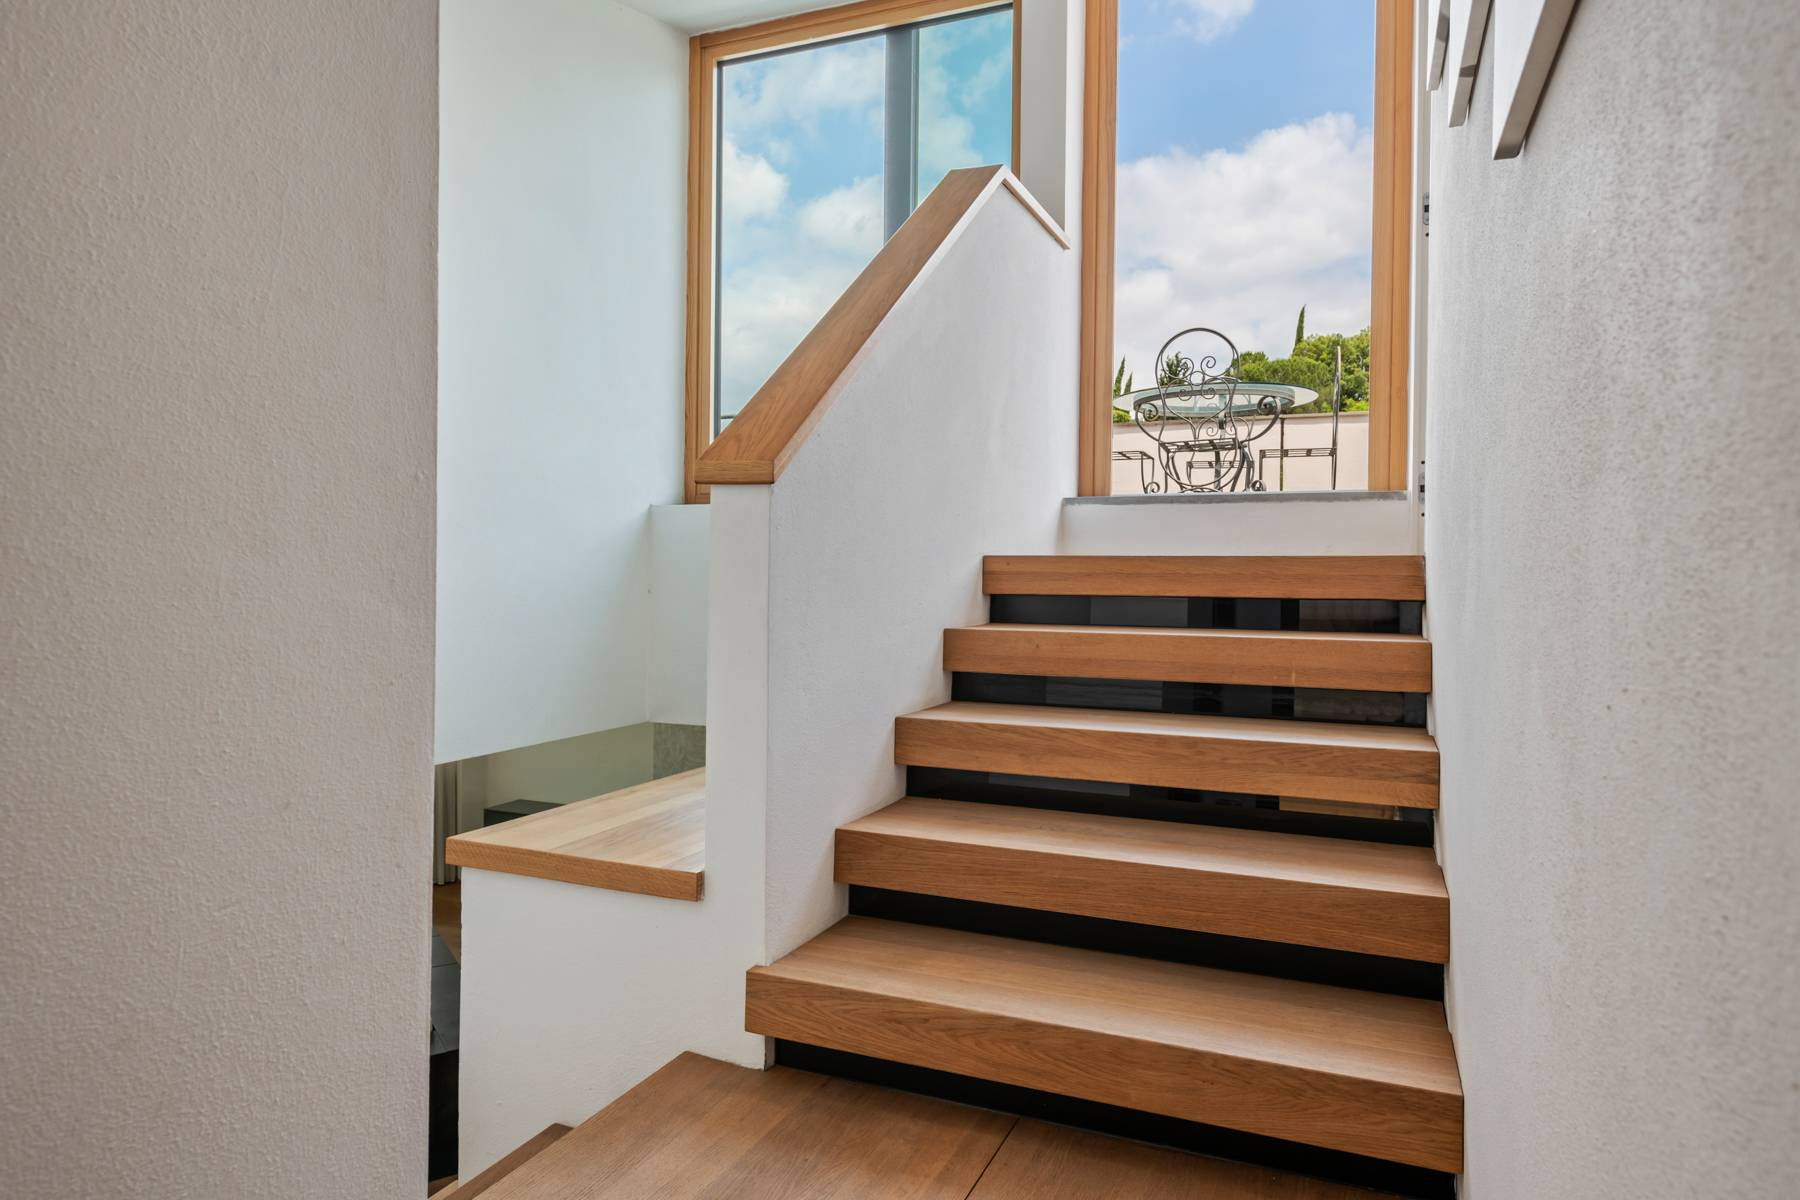 Appartamento in Vendita a Pontassieve: 5 locali, 300 mq - Foto 12